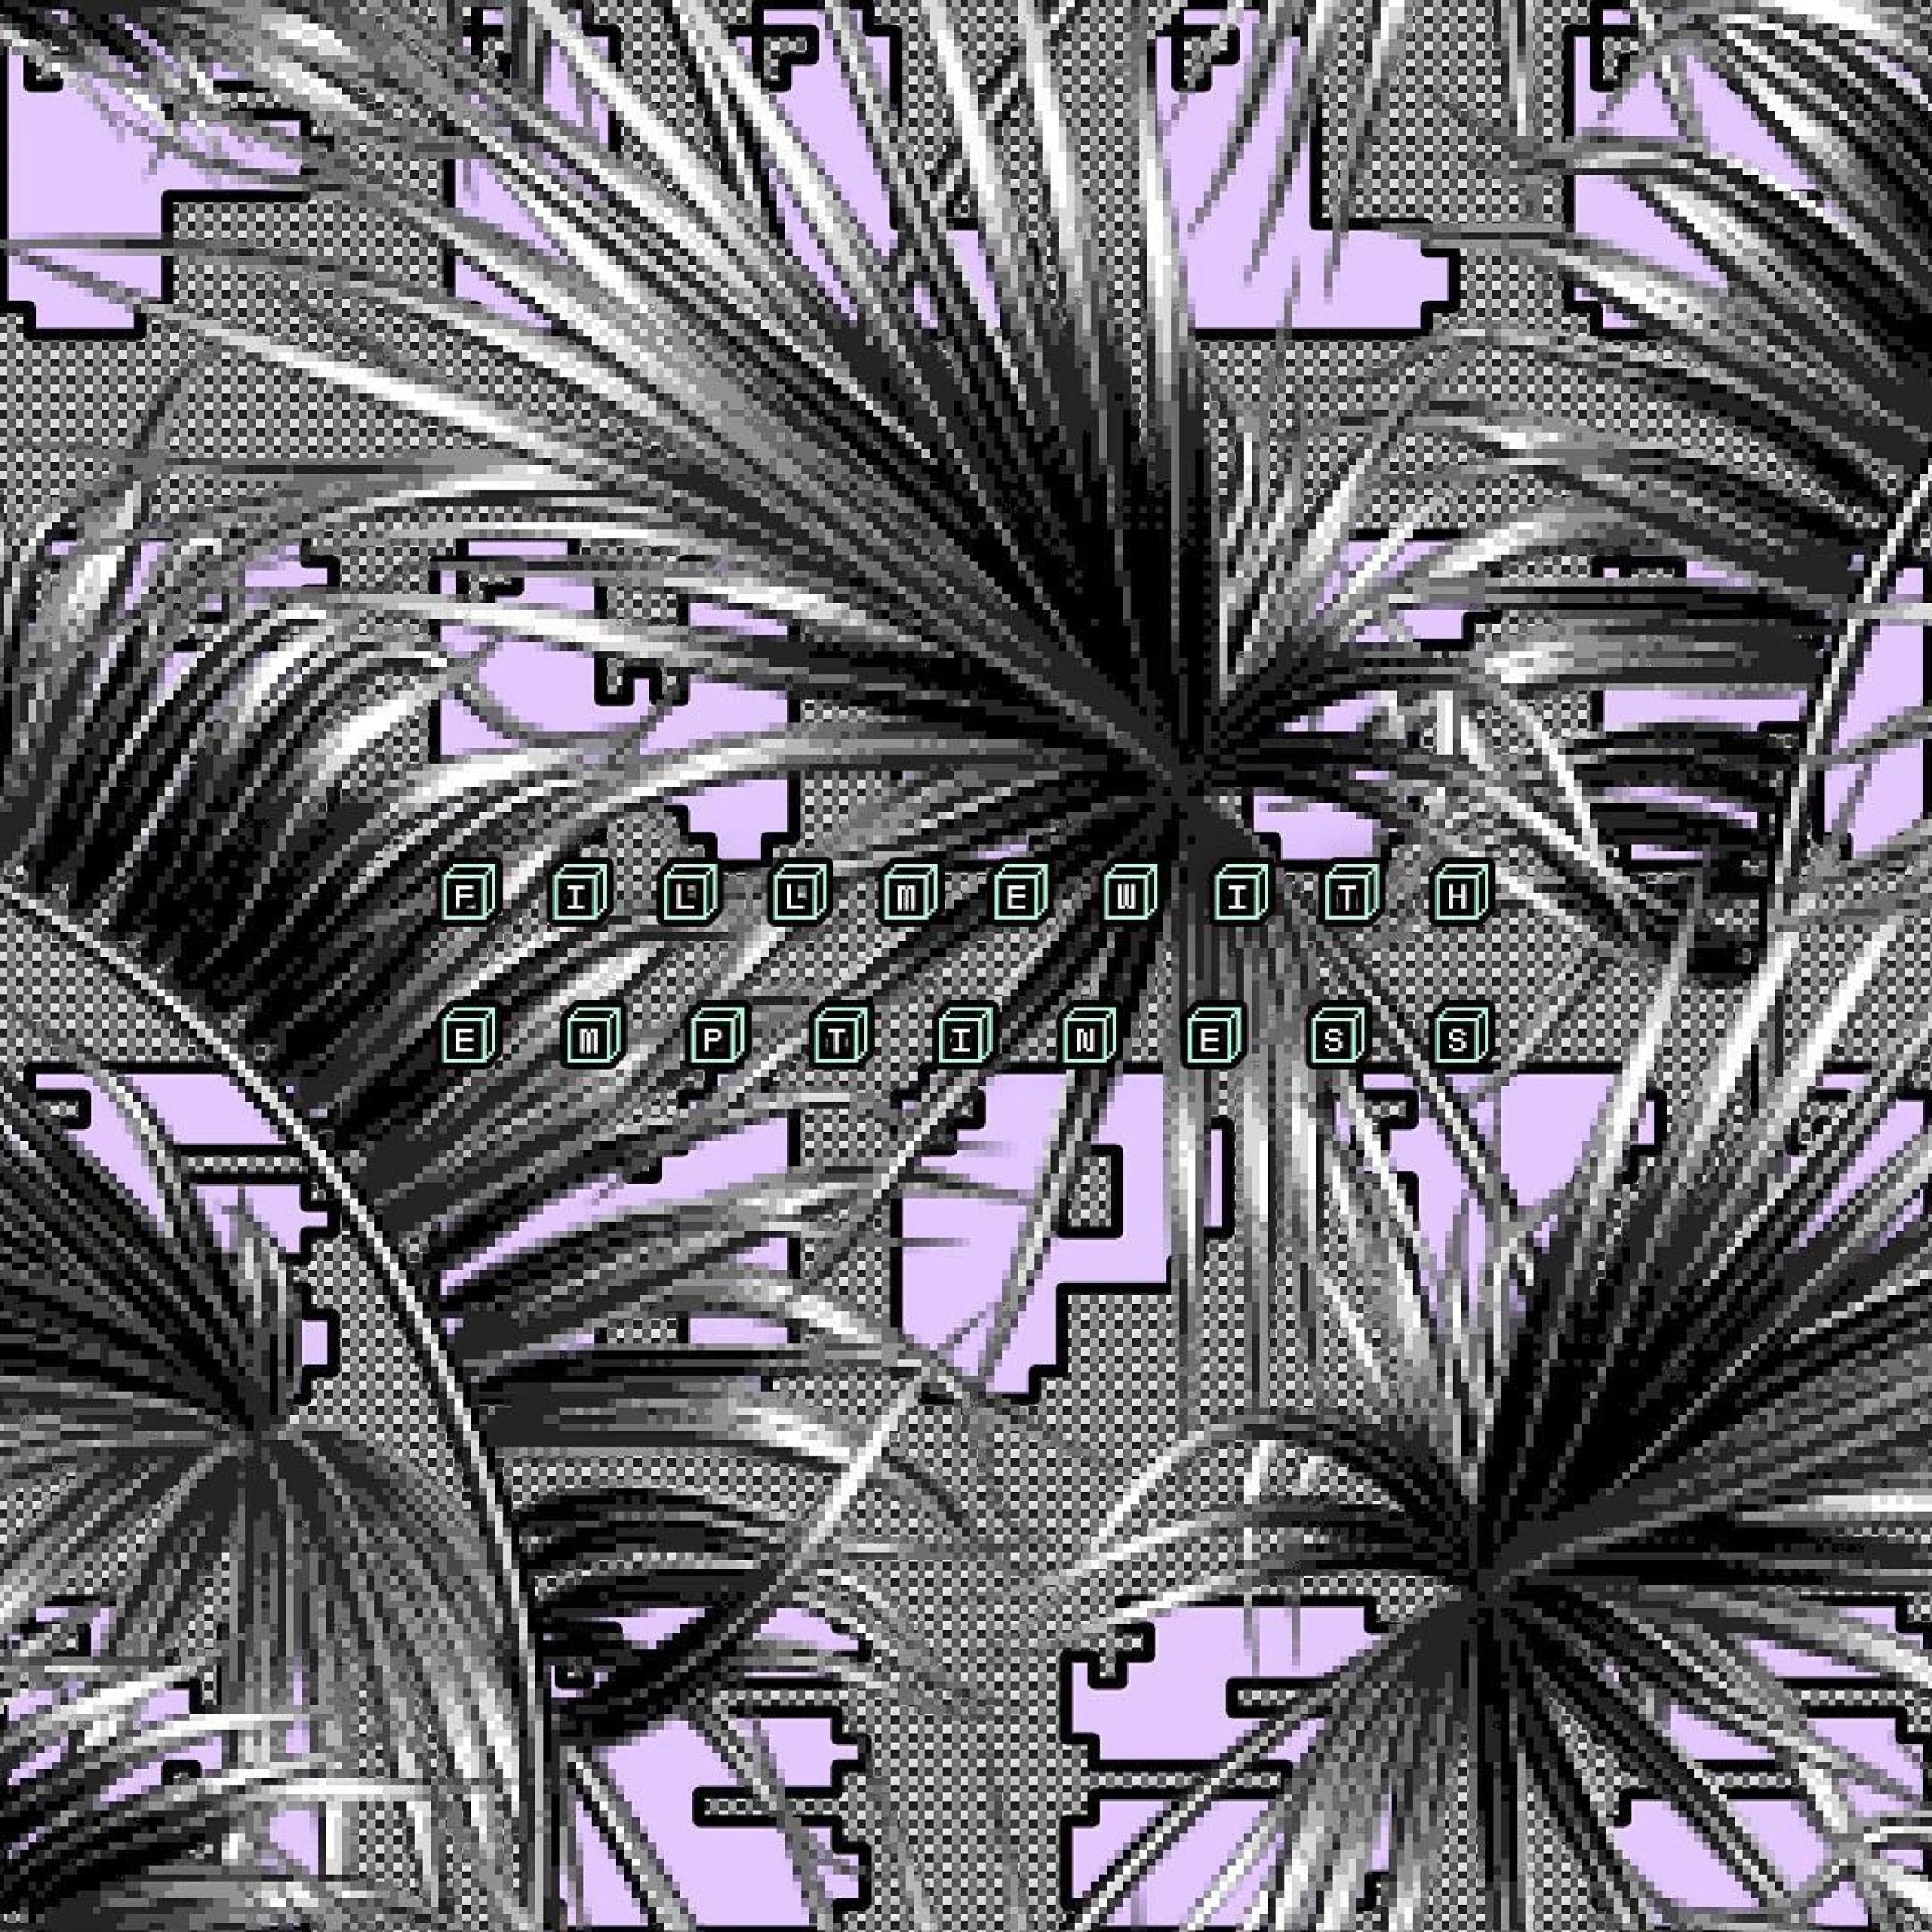 Fill emptyness - newmedia, glitchart - bonniethunderstorms | ello